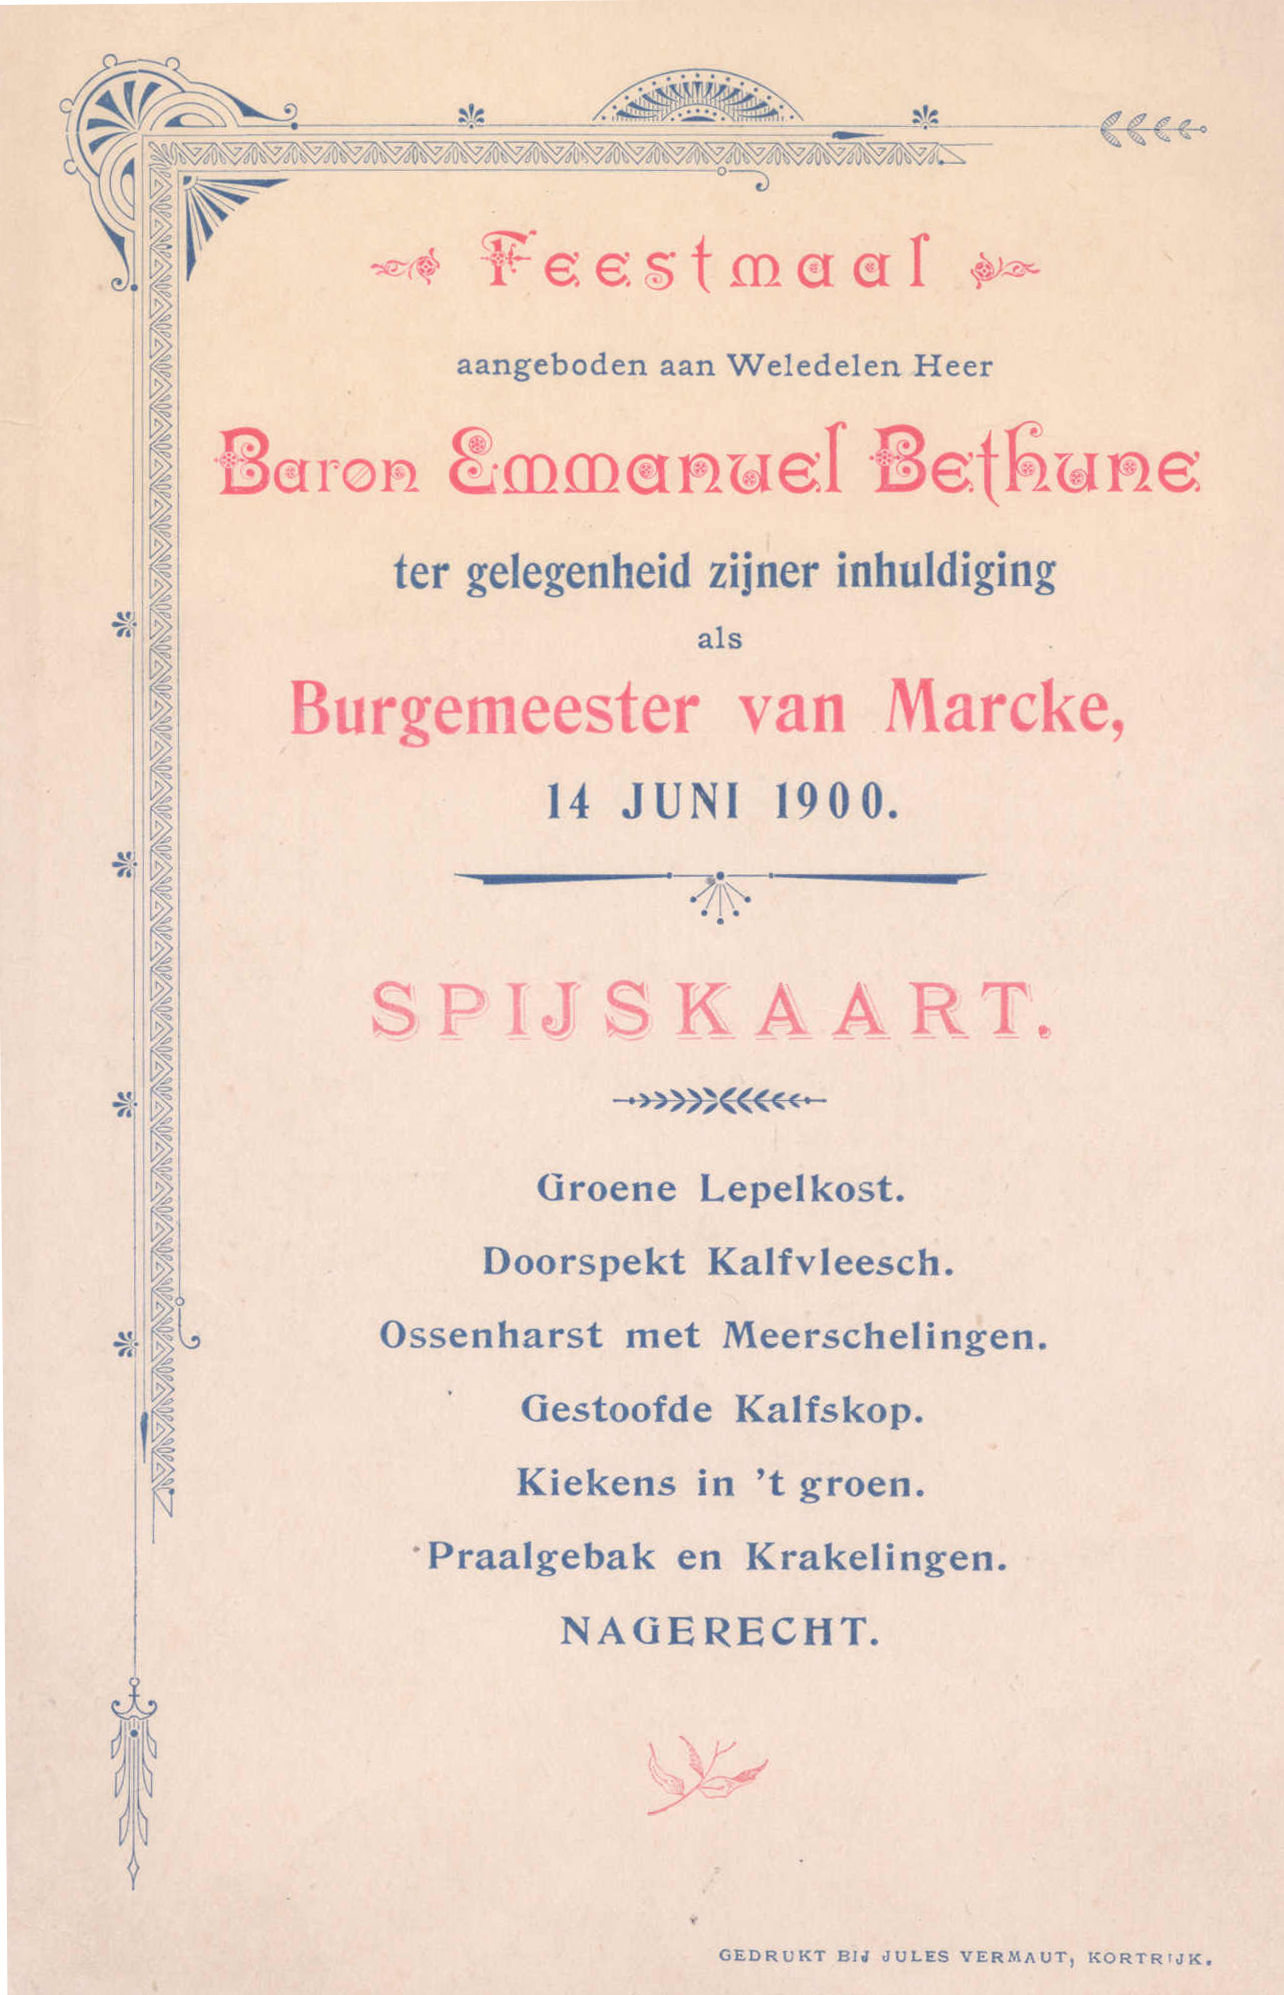 Feestmaal inhuldiging Emmanuel de Bethune 1900